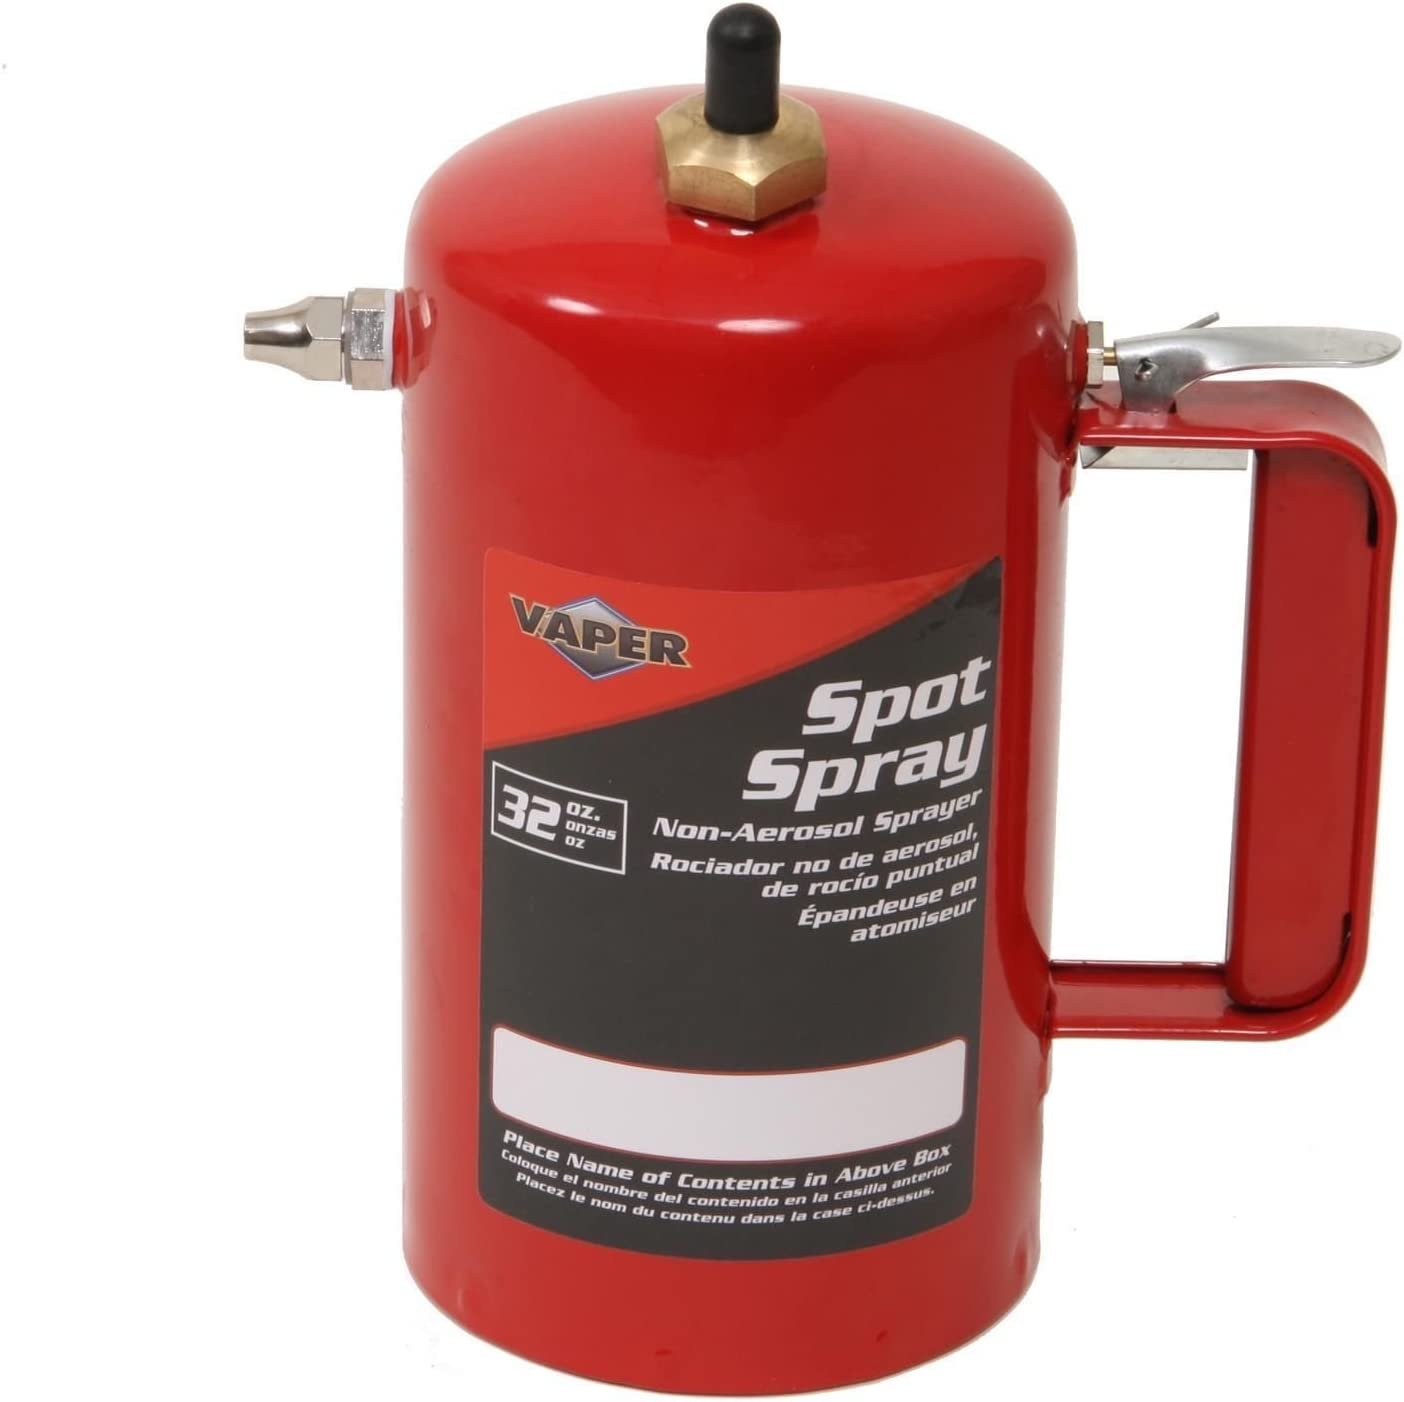 Vaper 19419 Red Spot Spray Non-Aerosol Sprayer (Red) - 32 oz. : Lawn And Garden Power Sprayers : Automotive